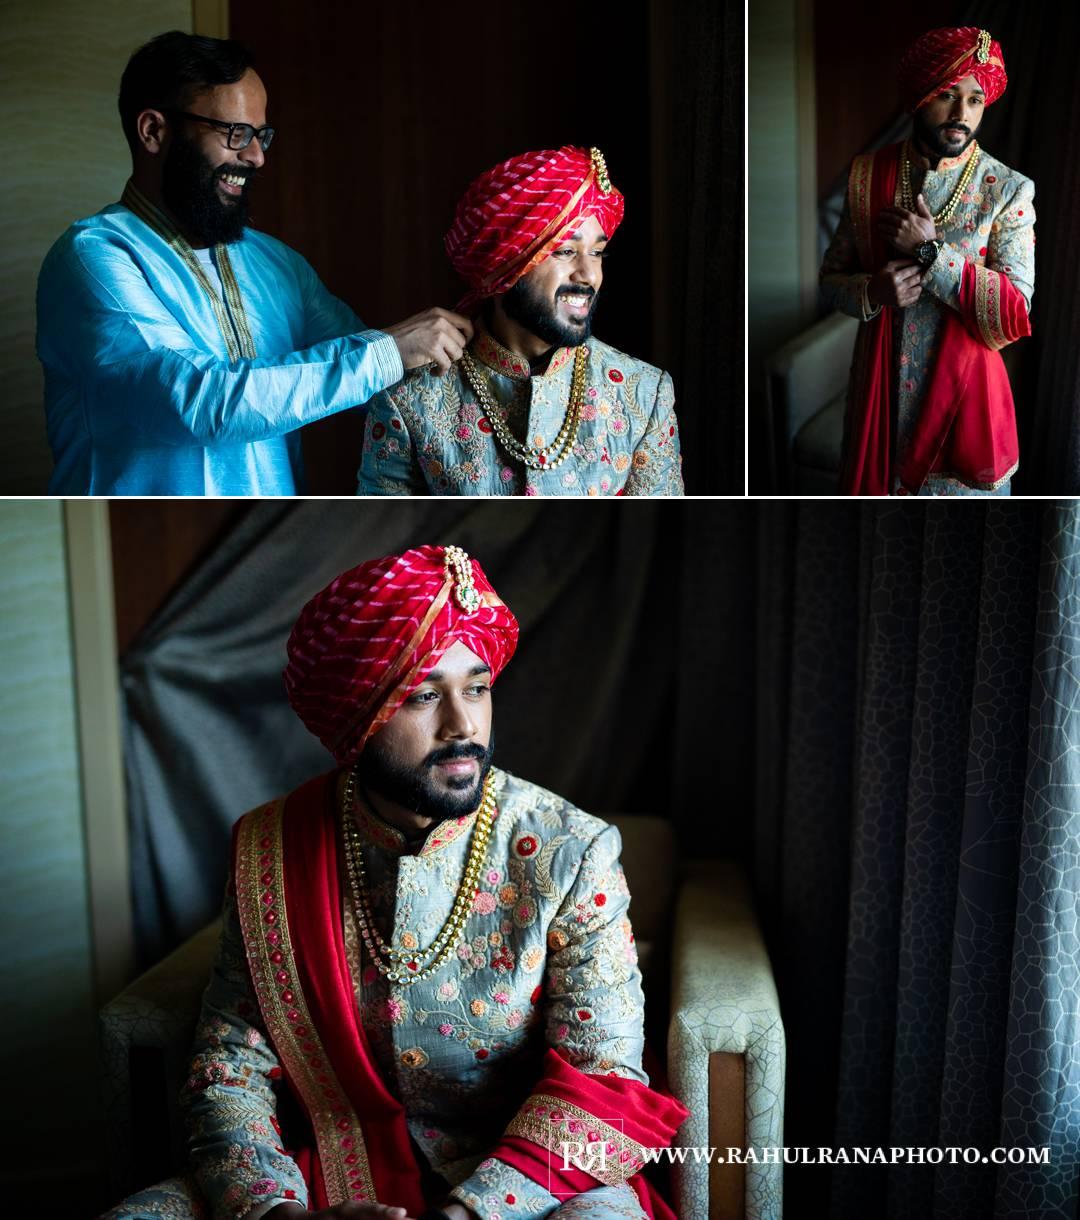 Westin North Shore - Wheeling Indian Wedding - Prachi Jay - Rahul Rana Photo